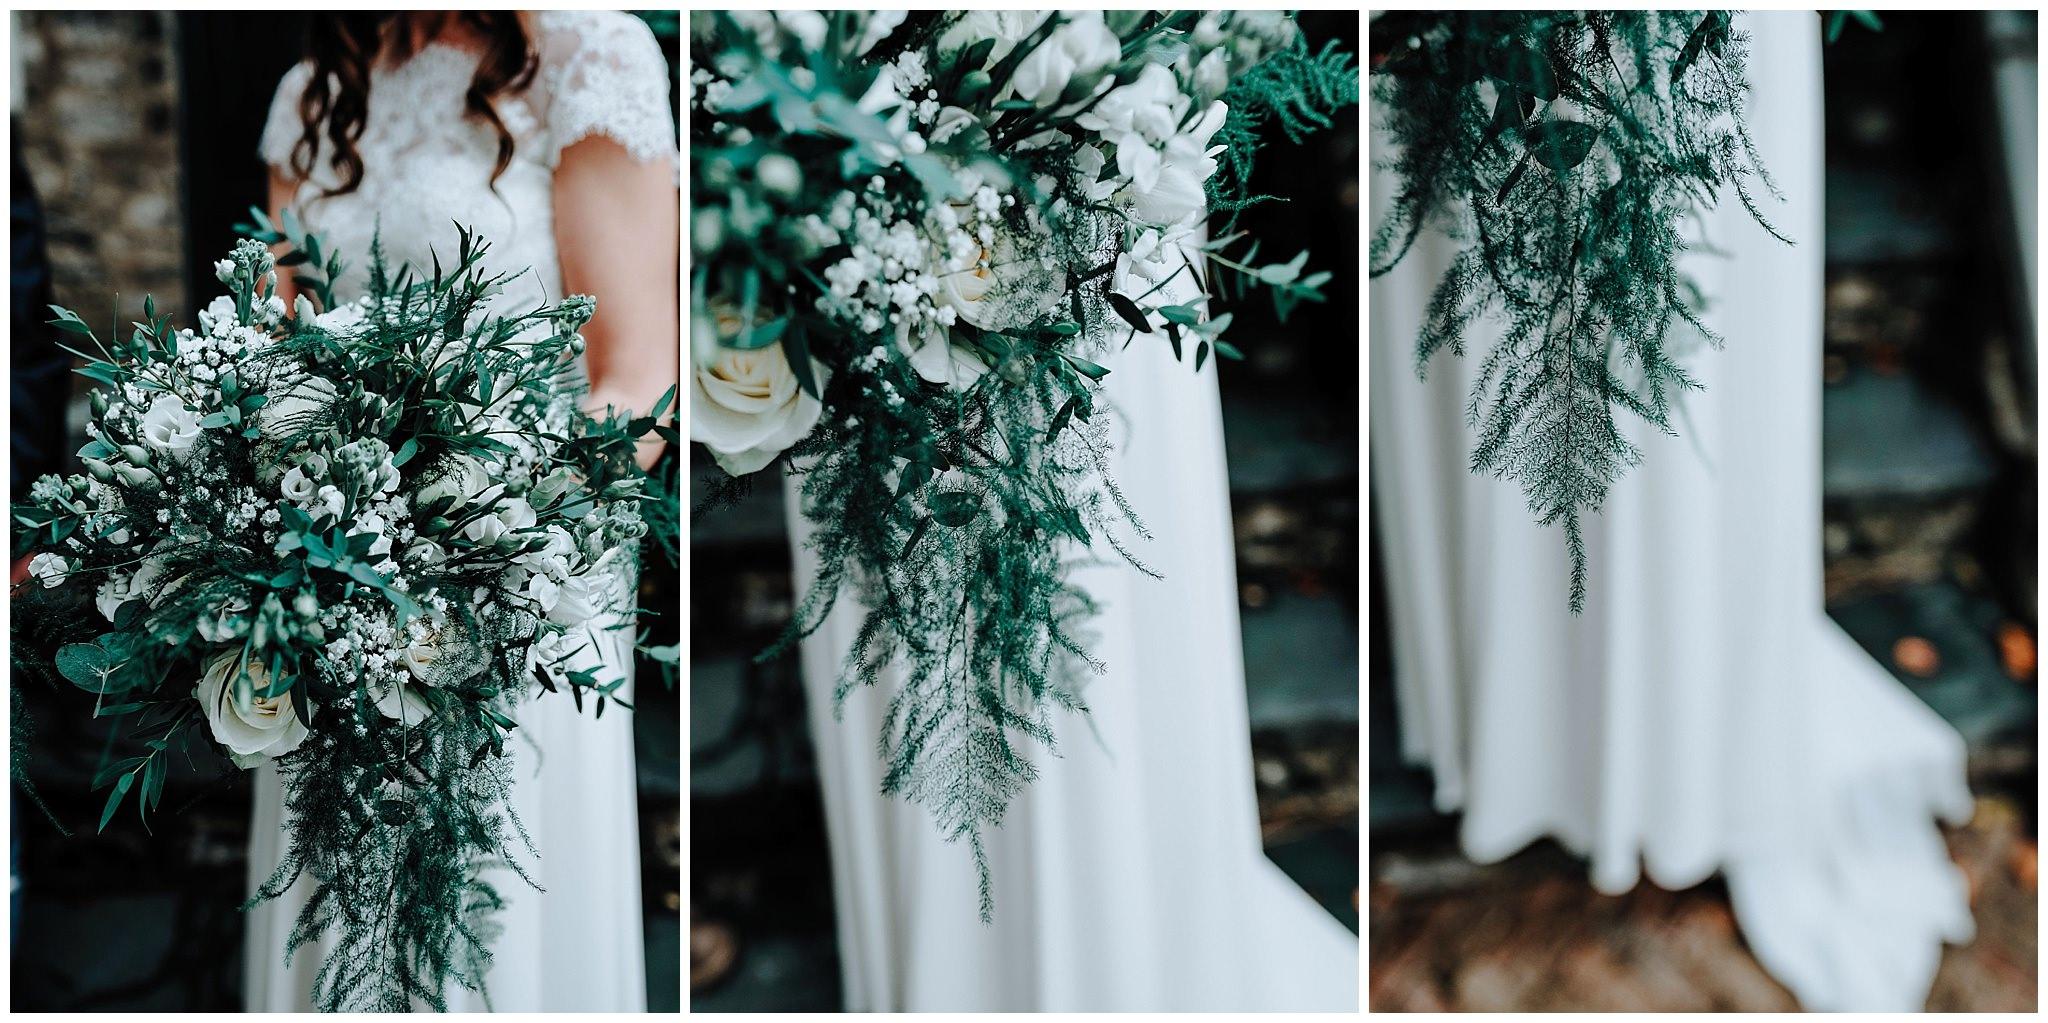 Brides bouquet at Bodnant Welsh Food Centre